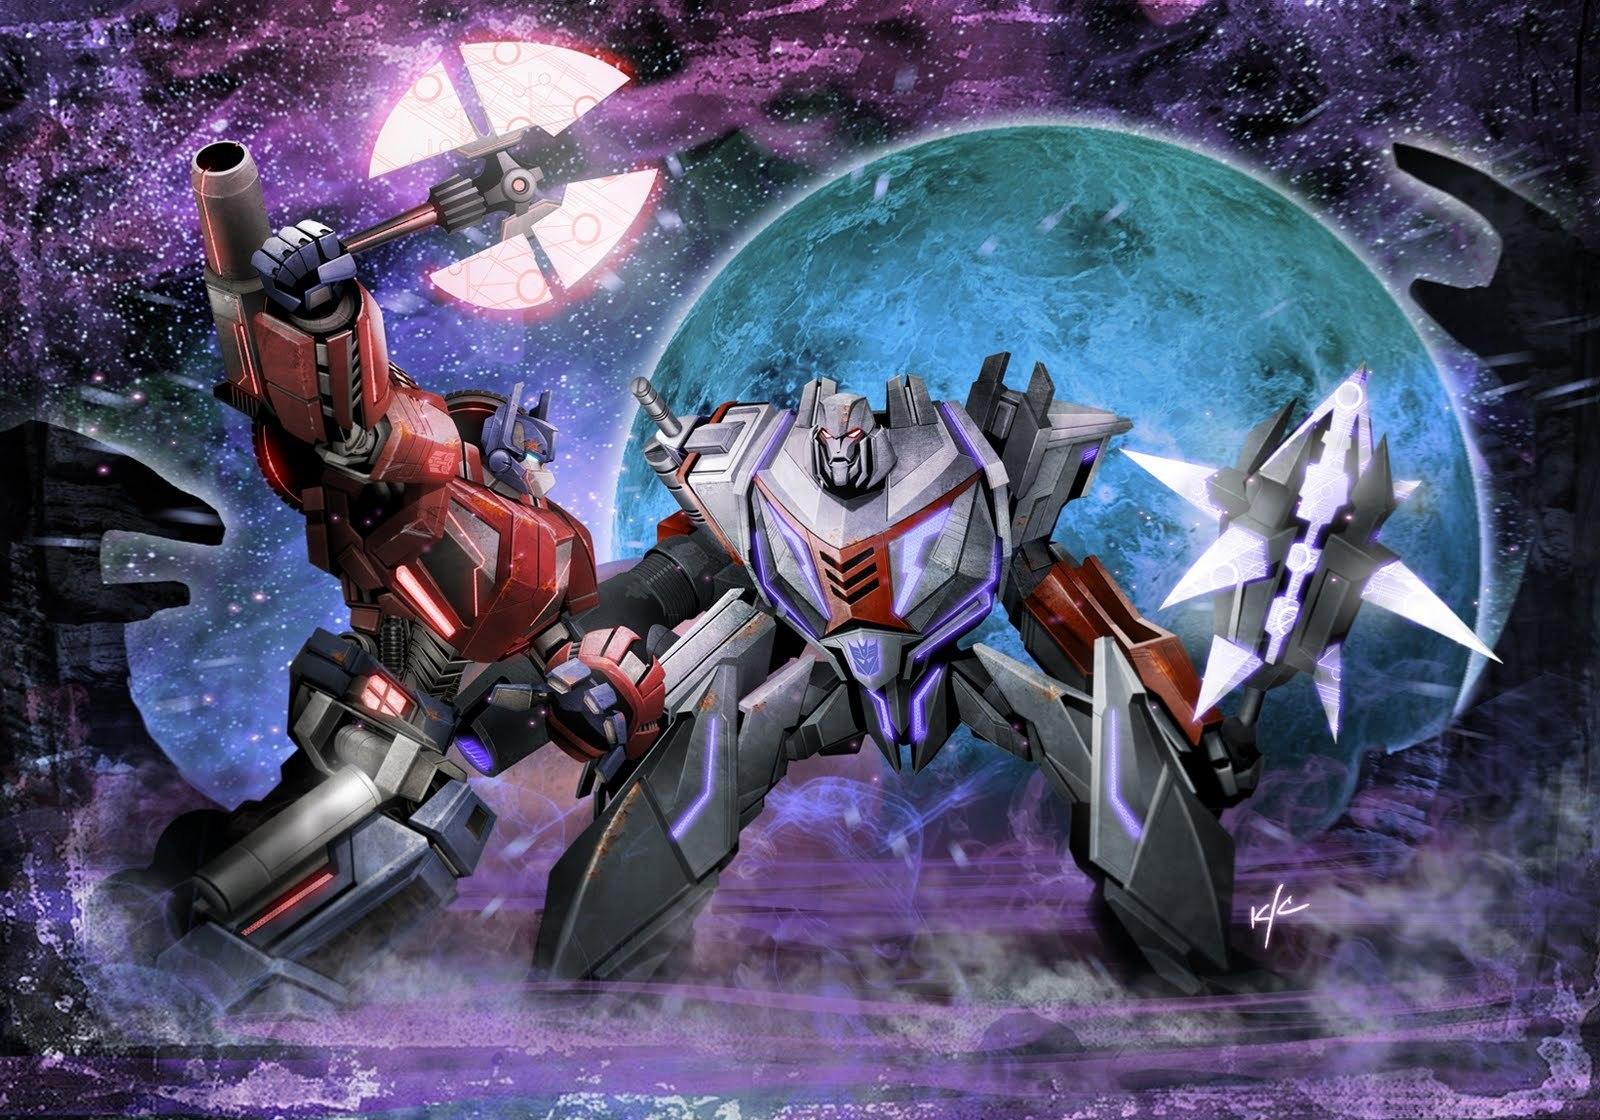 Transformers Fall Of Cybertron 4k Wallpaper Transformers War For Cybertron Images Transformers Hd